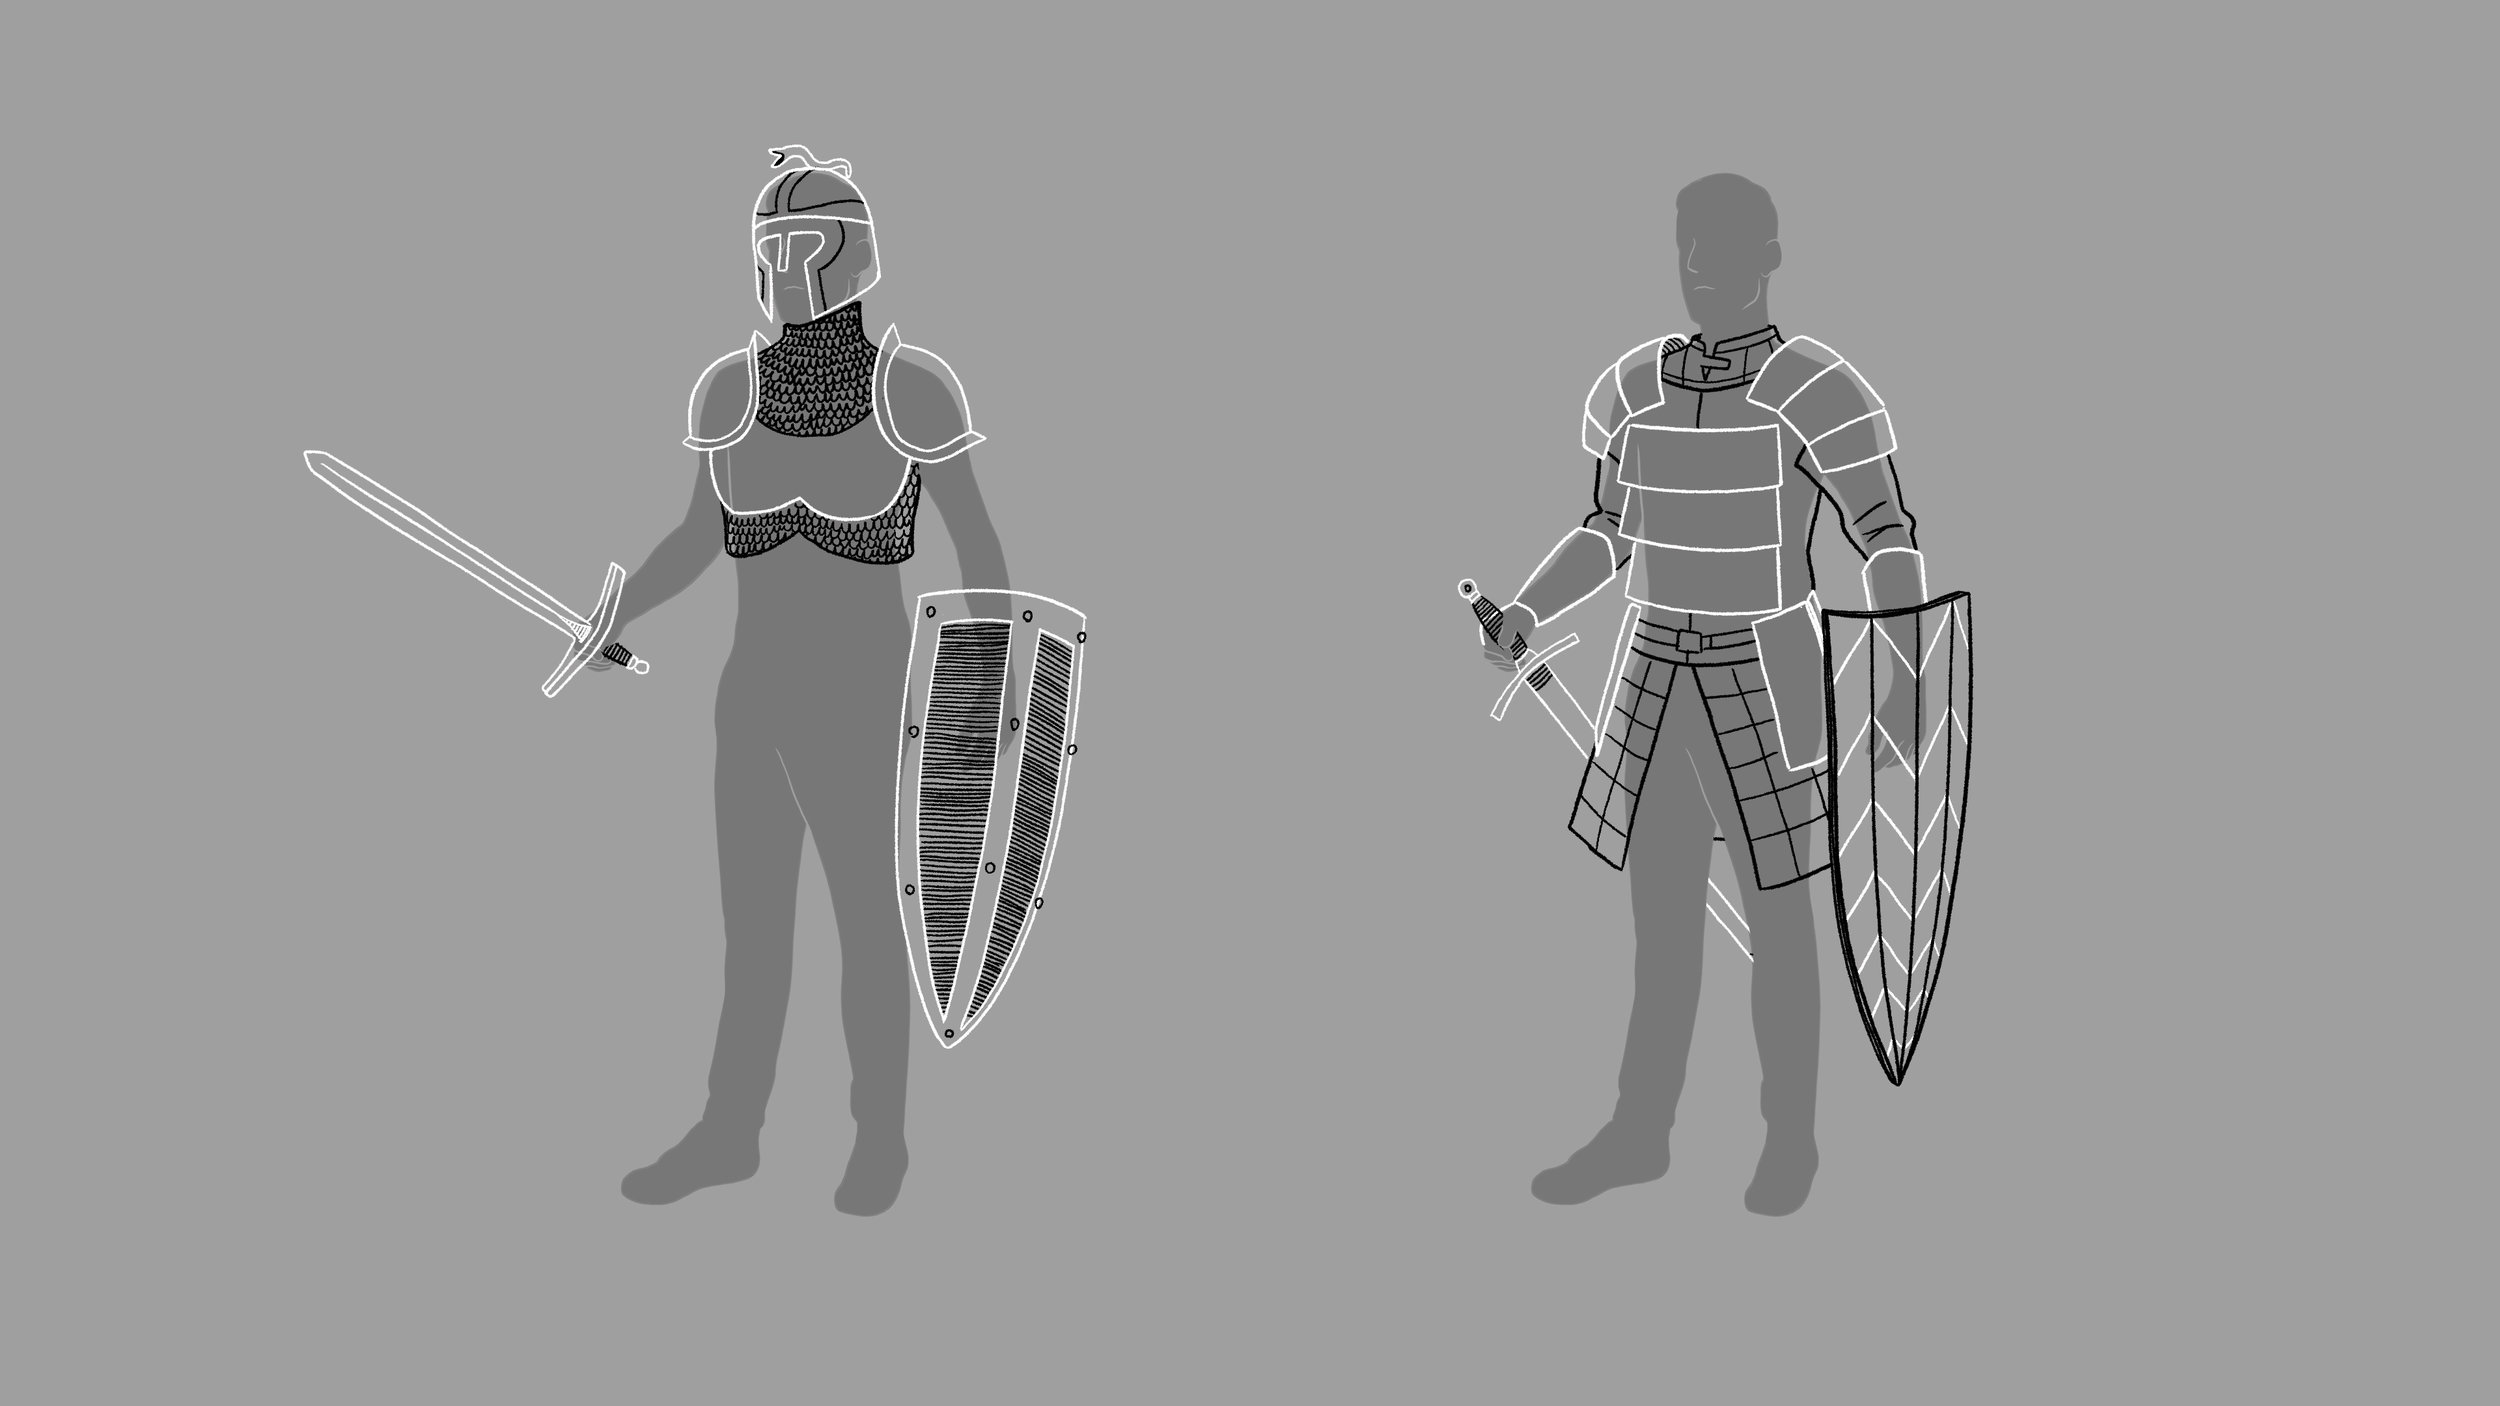 Knights_B_007.jpg